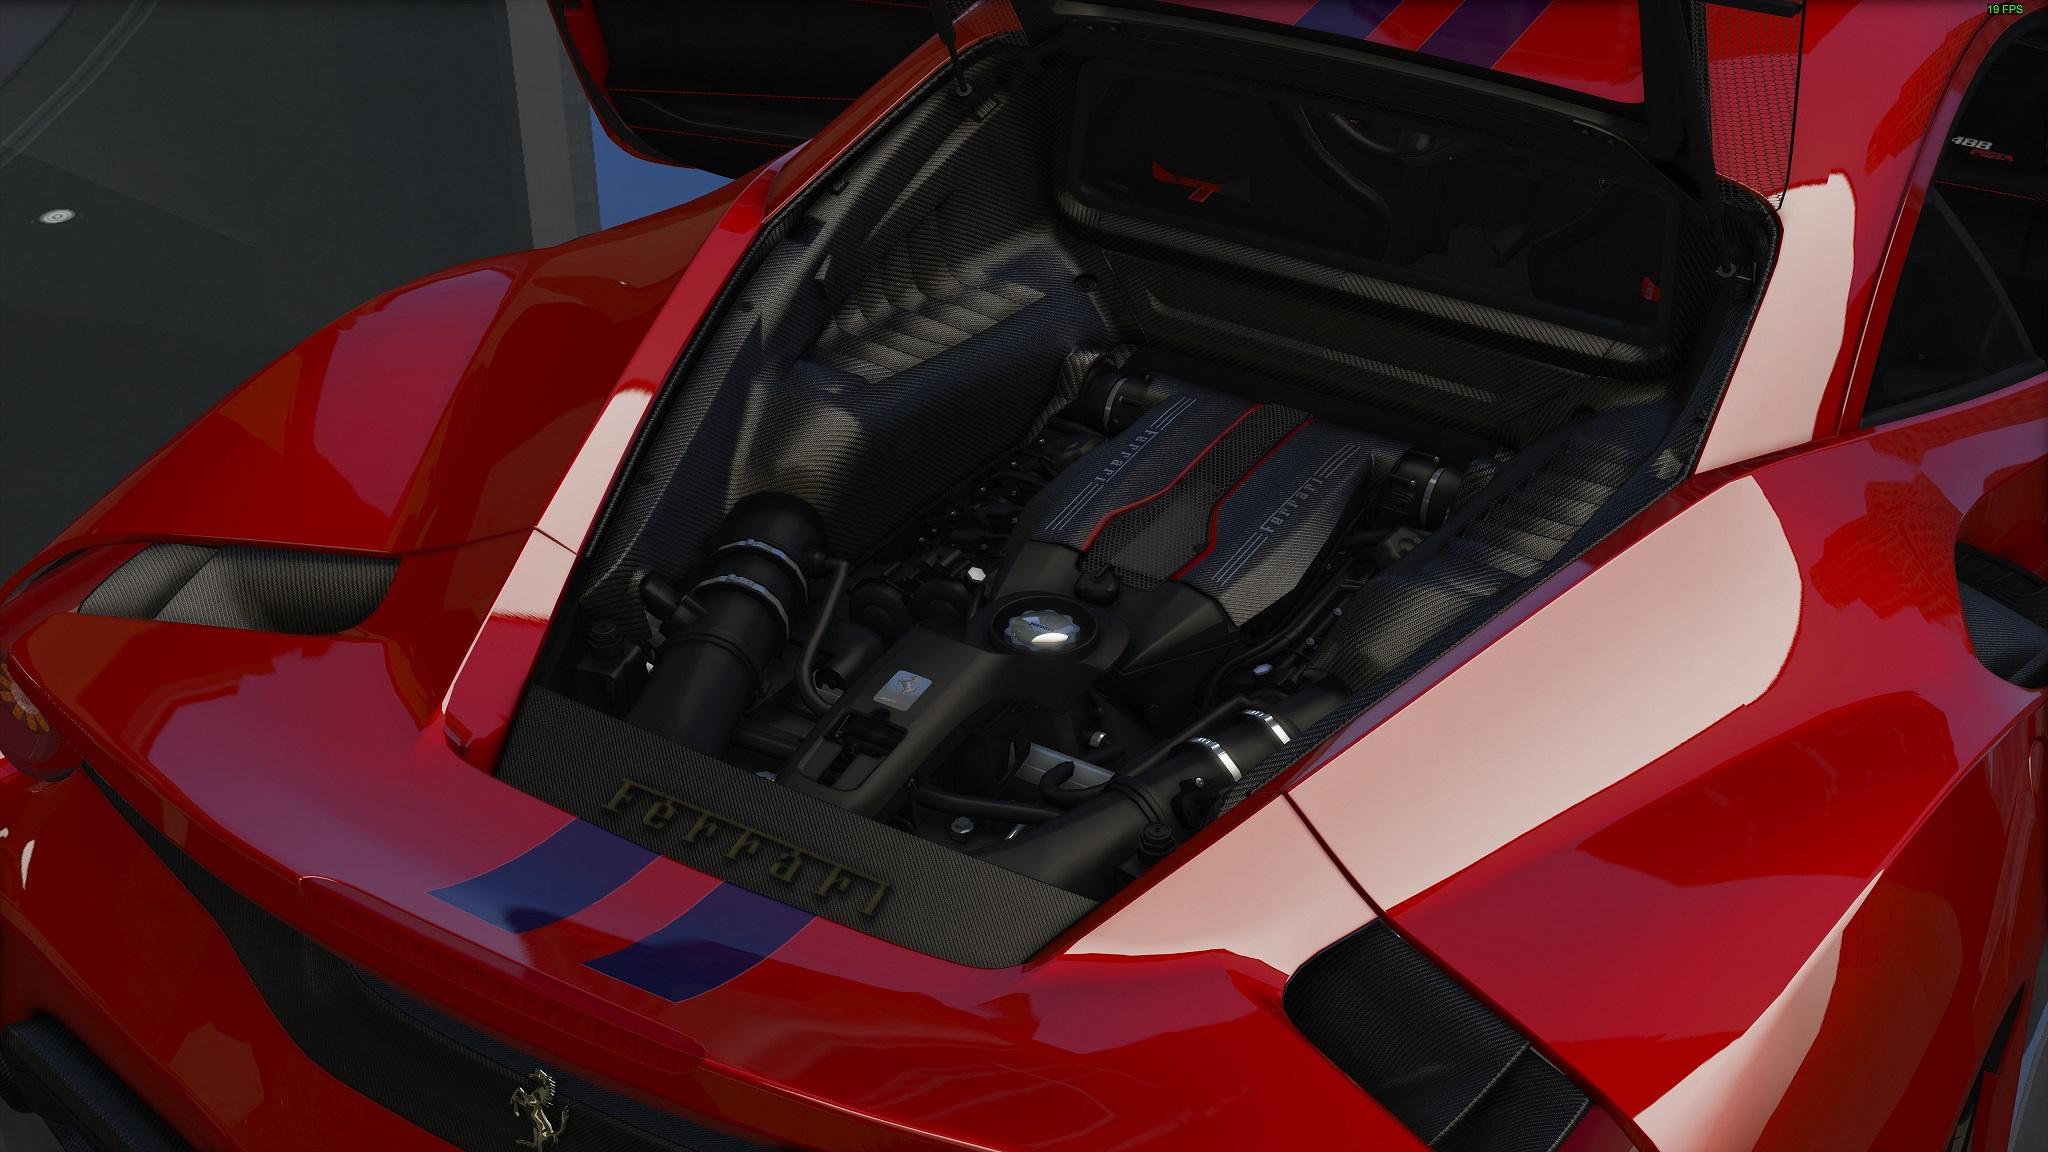 2019 Ferrari 488 Pista [Add-On/Template] - GTA5-Mods com